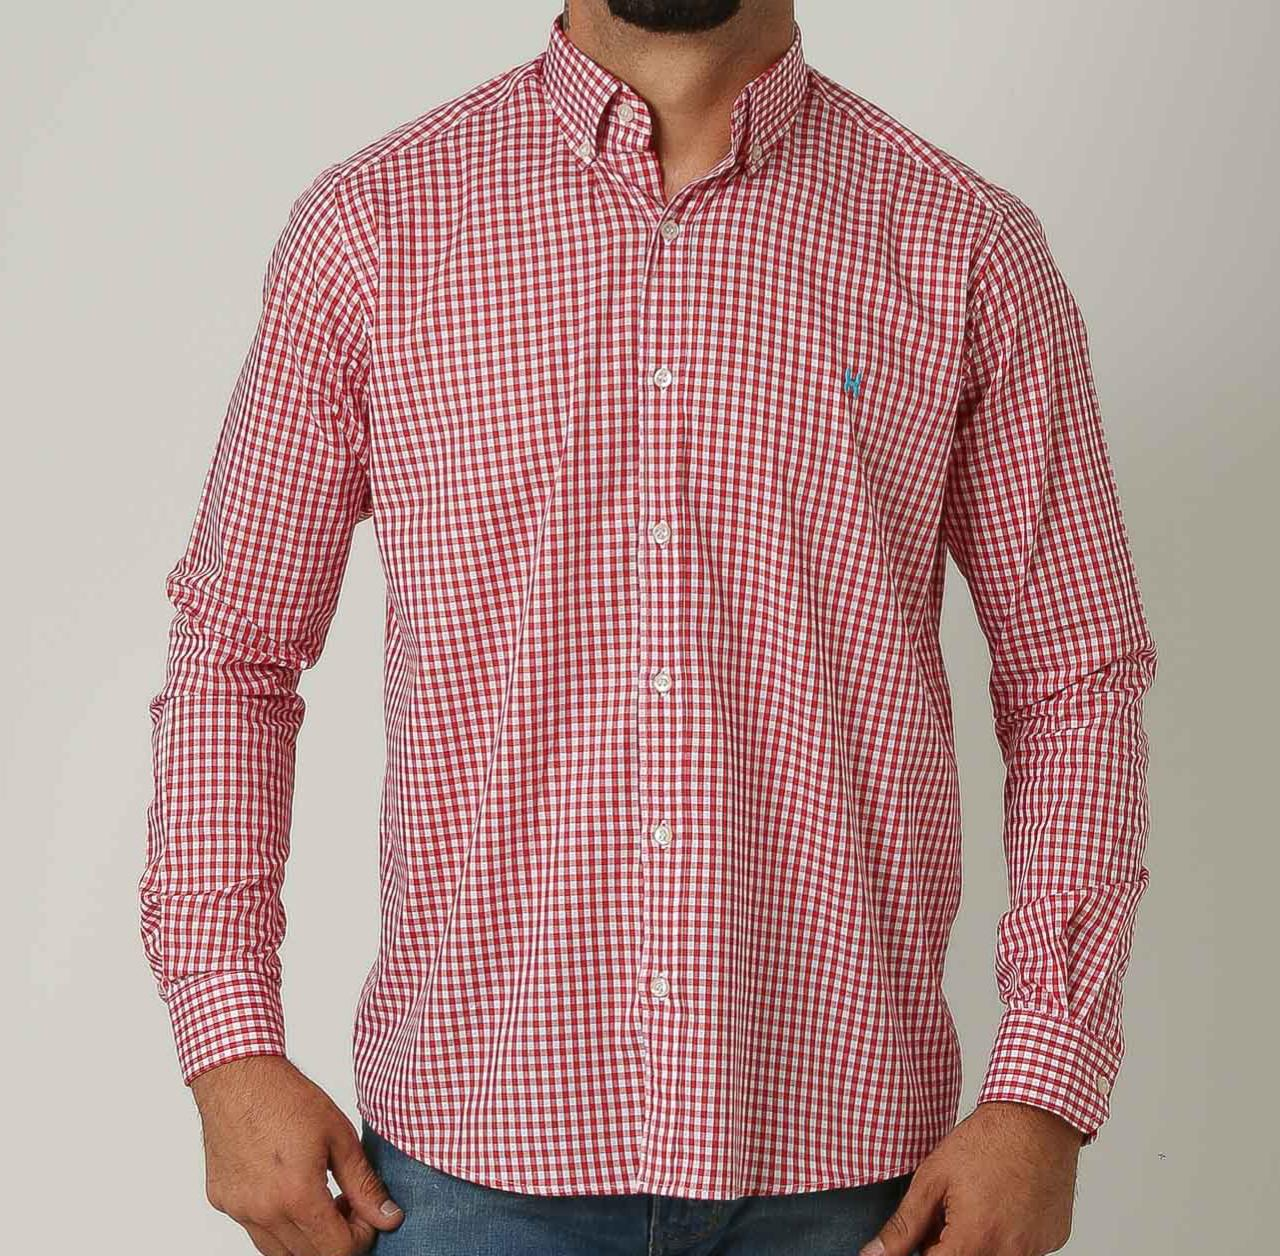 Camisa TXC Manga Longa Listrada Vermelho e Branco